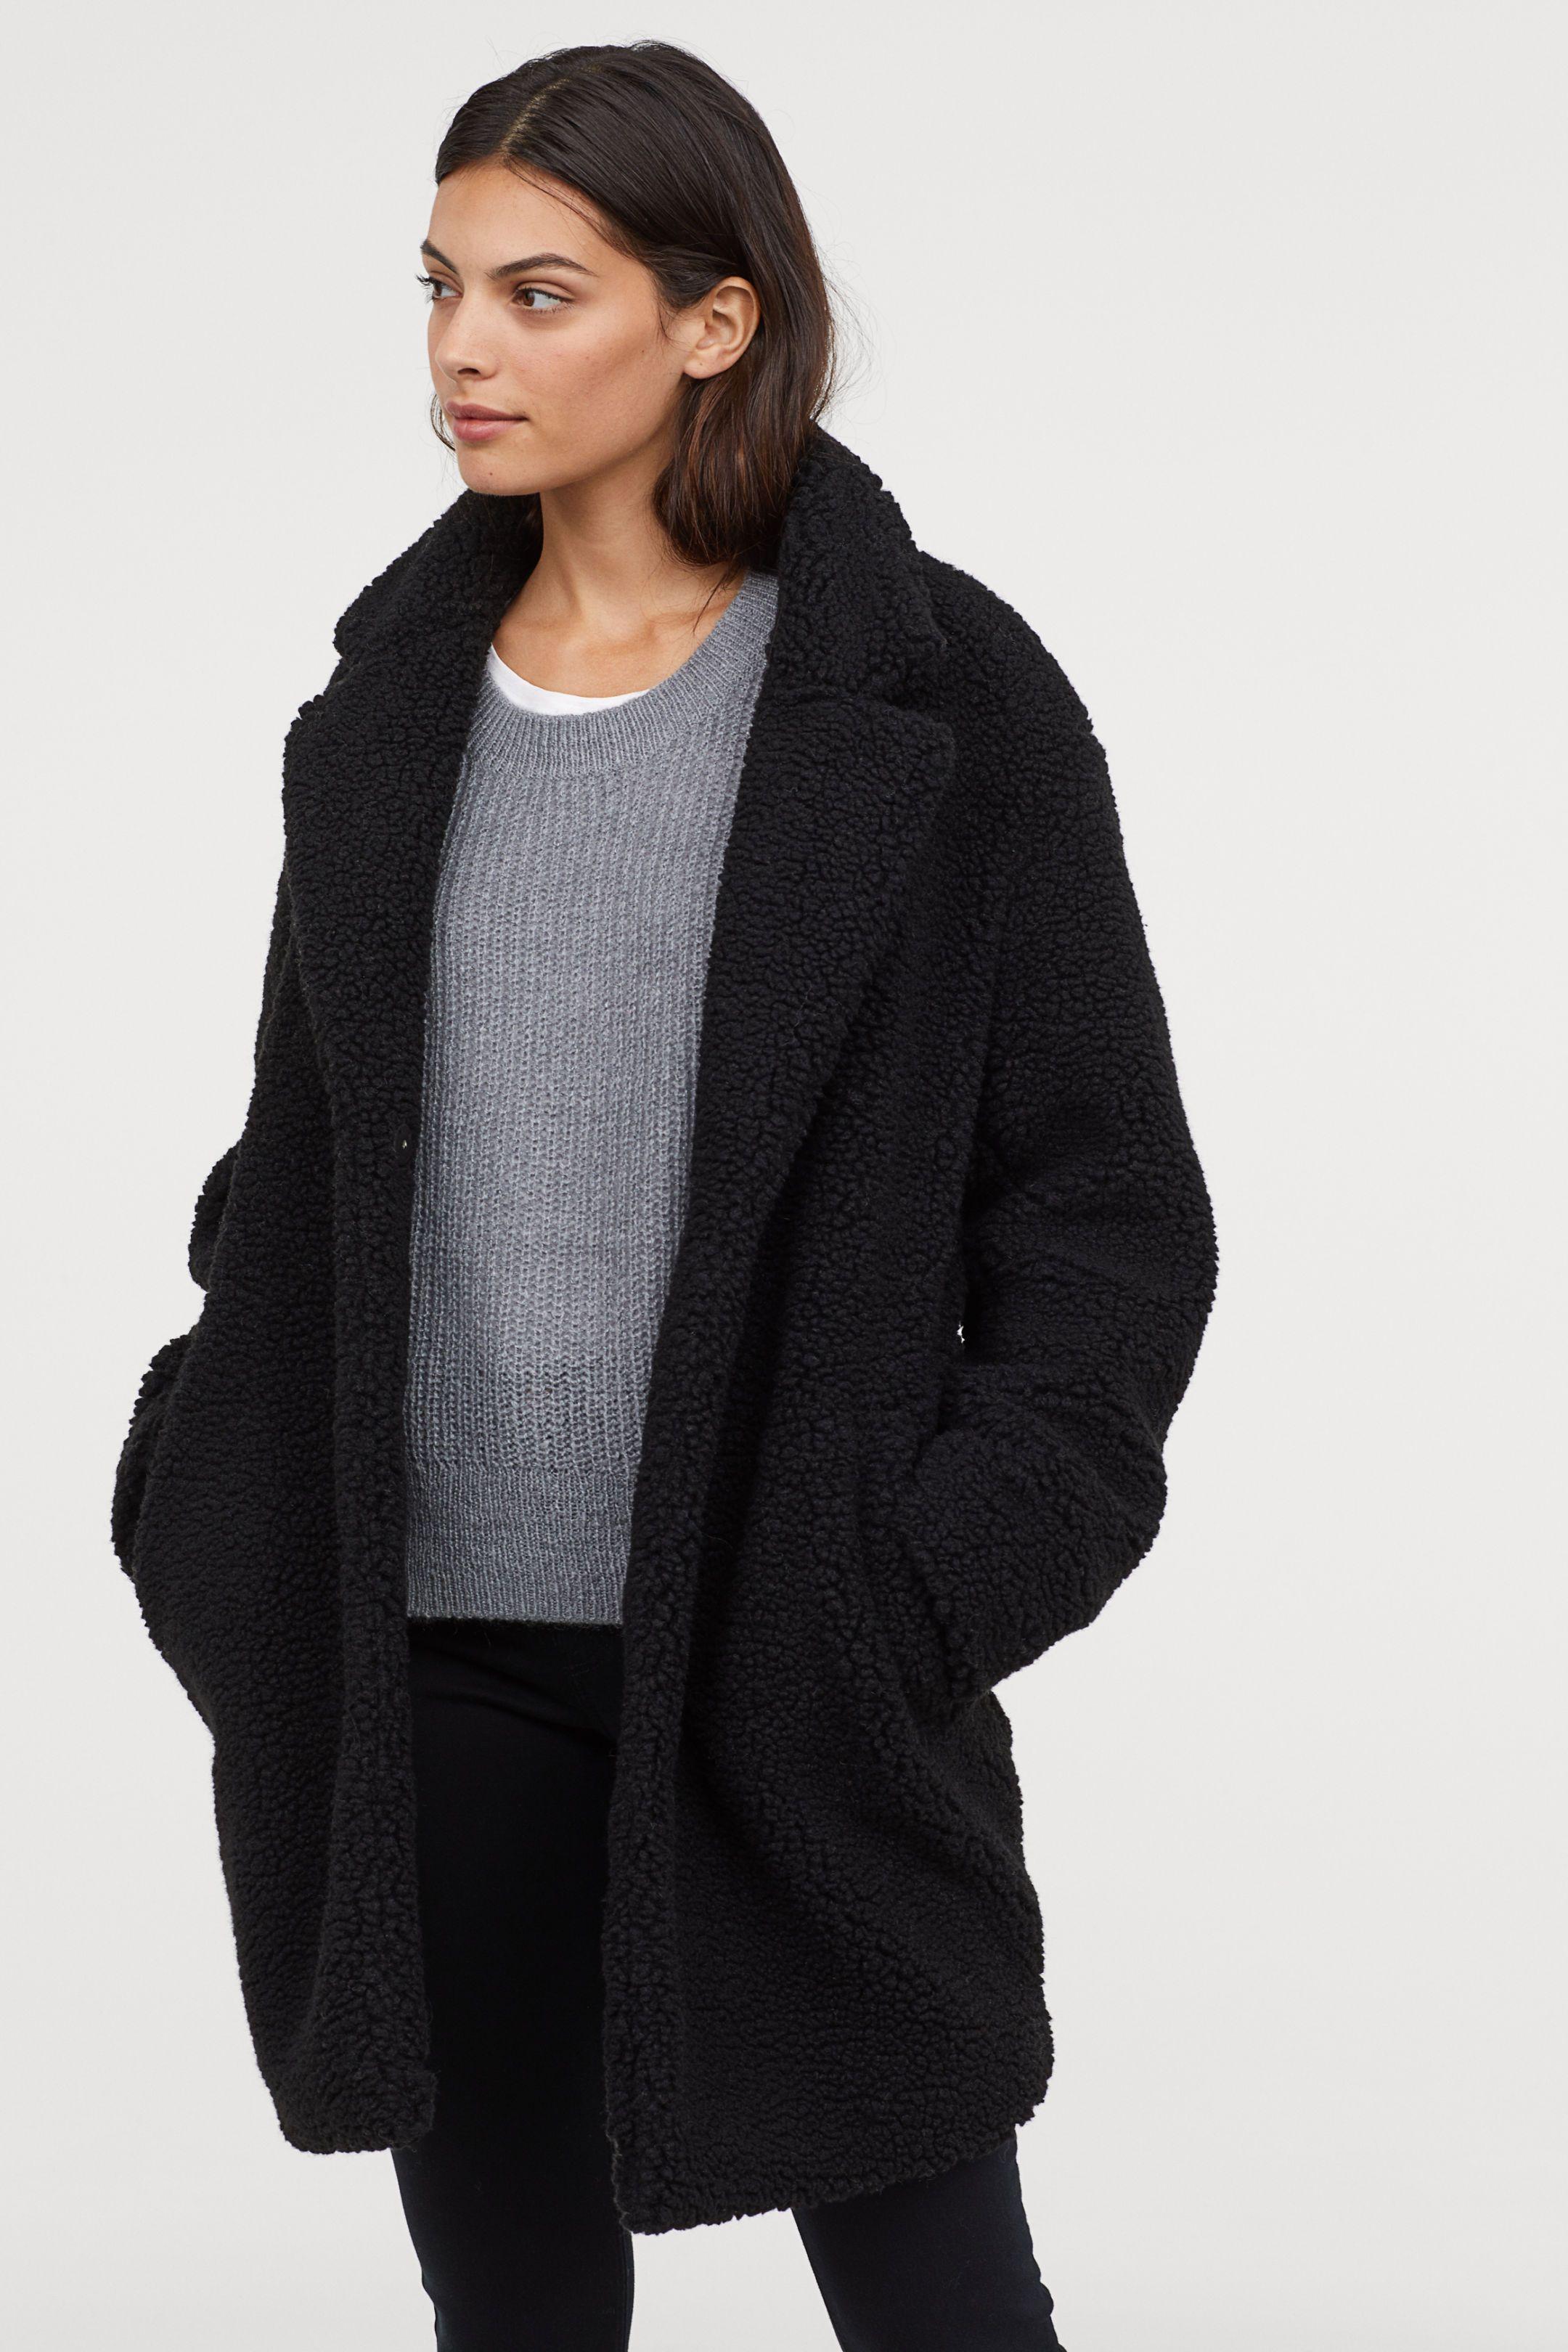 Long Pile Coat Black Ladies | H&M US 1 | Faux shearling